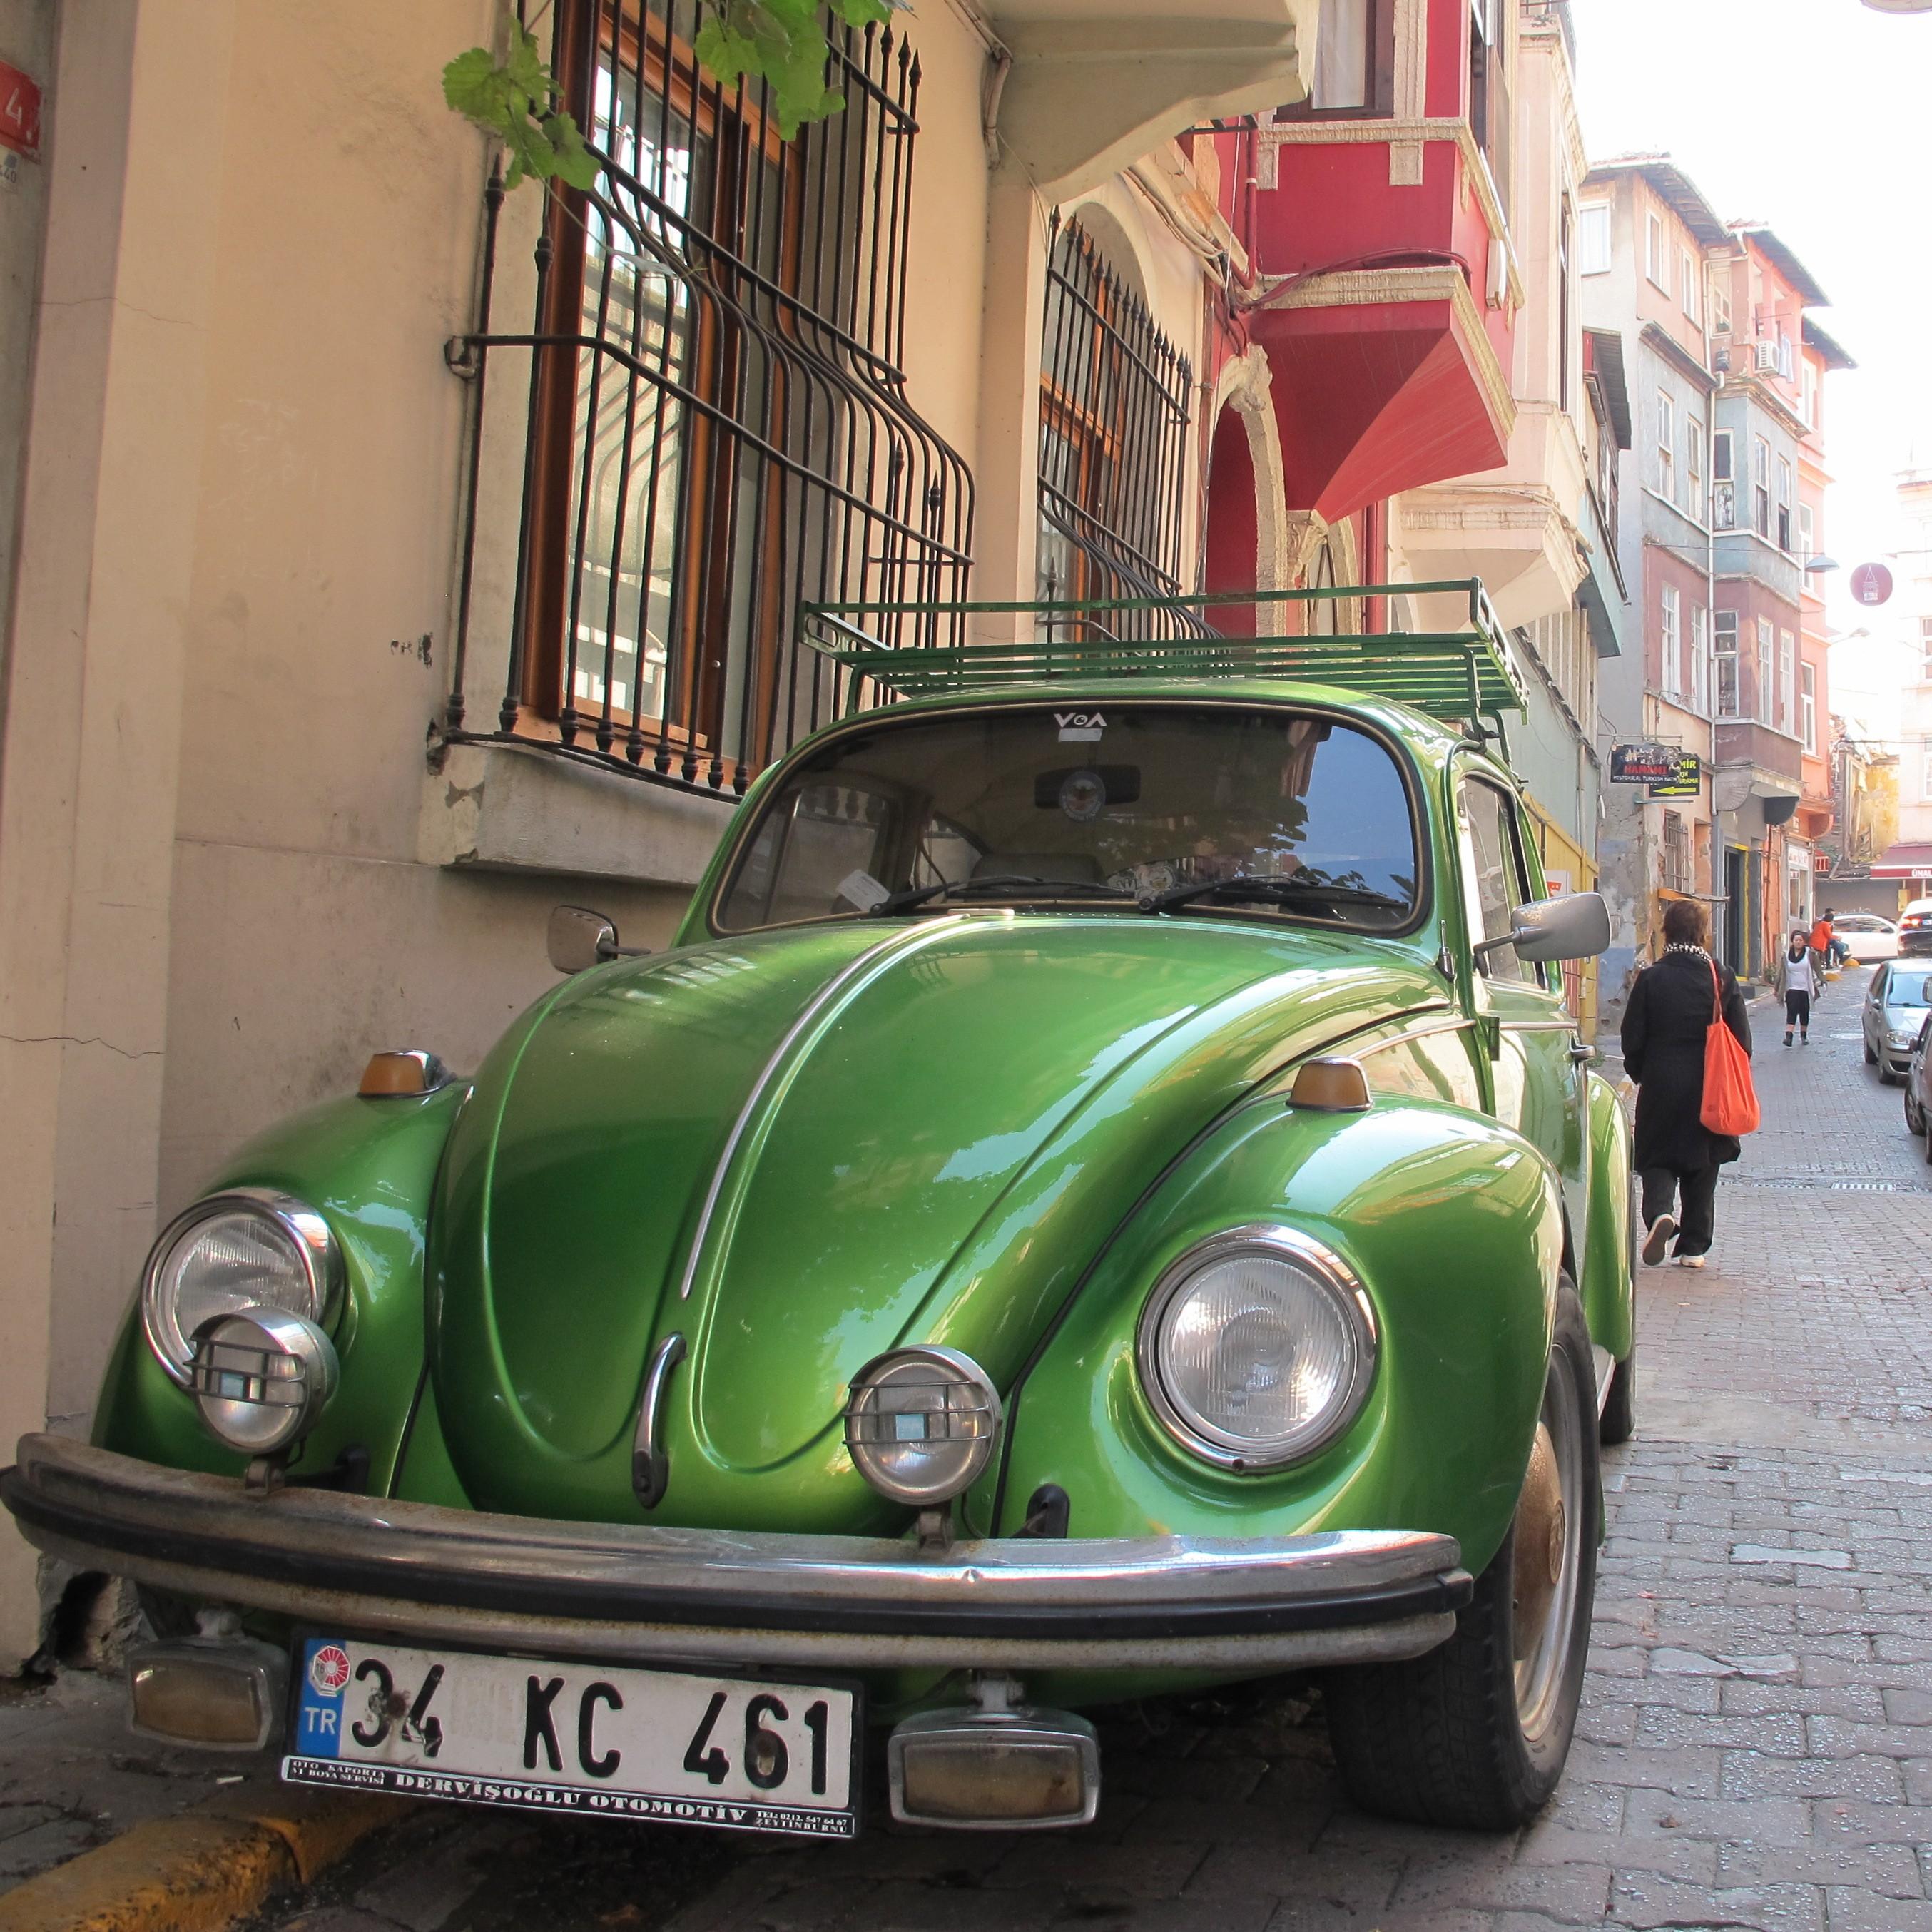 Volkswagen Beetle, Cukurcuma Street